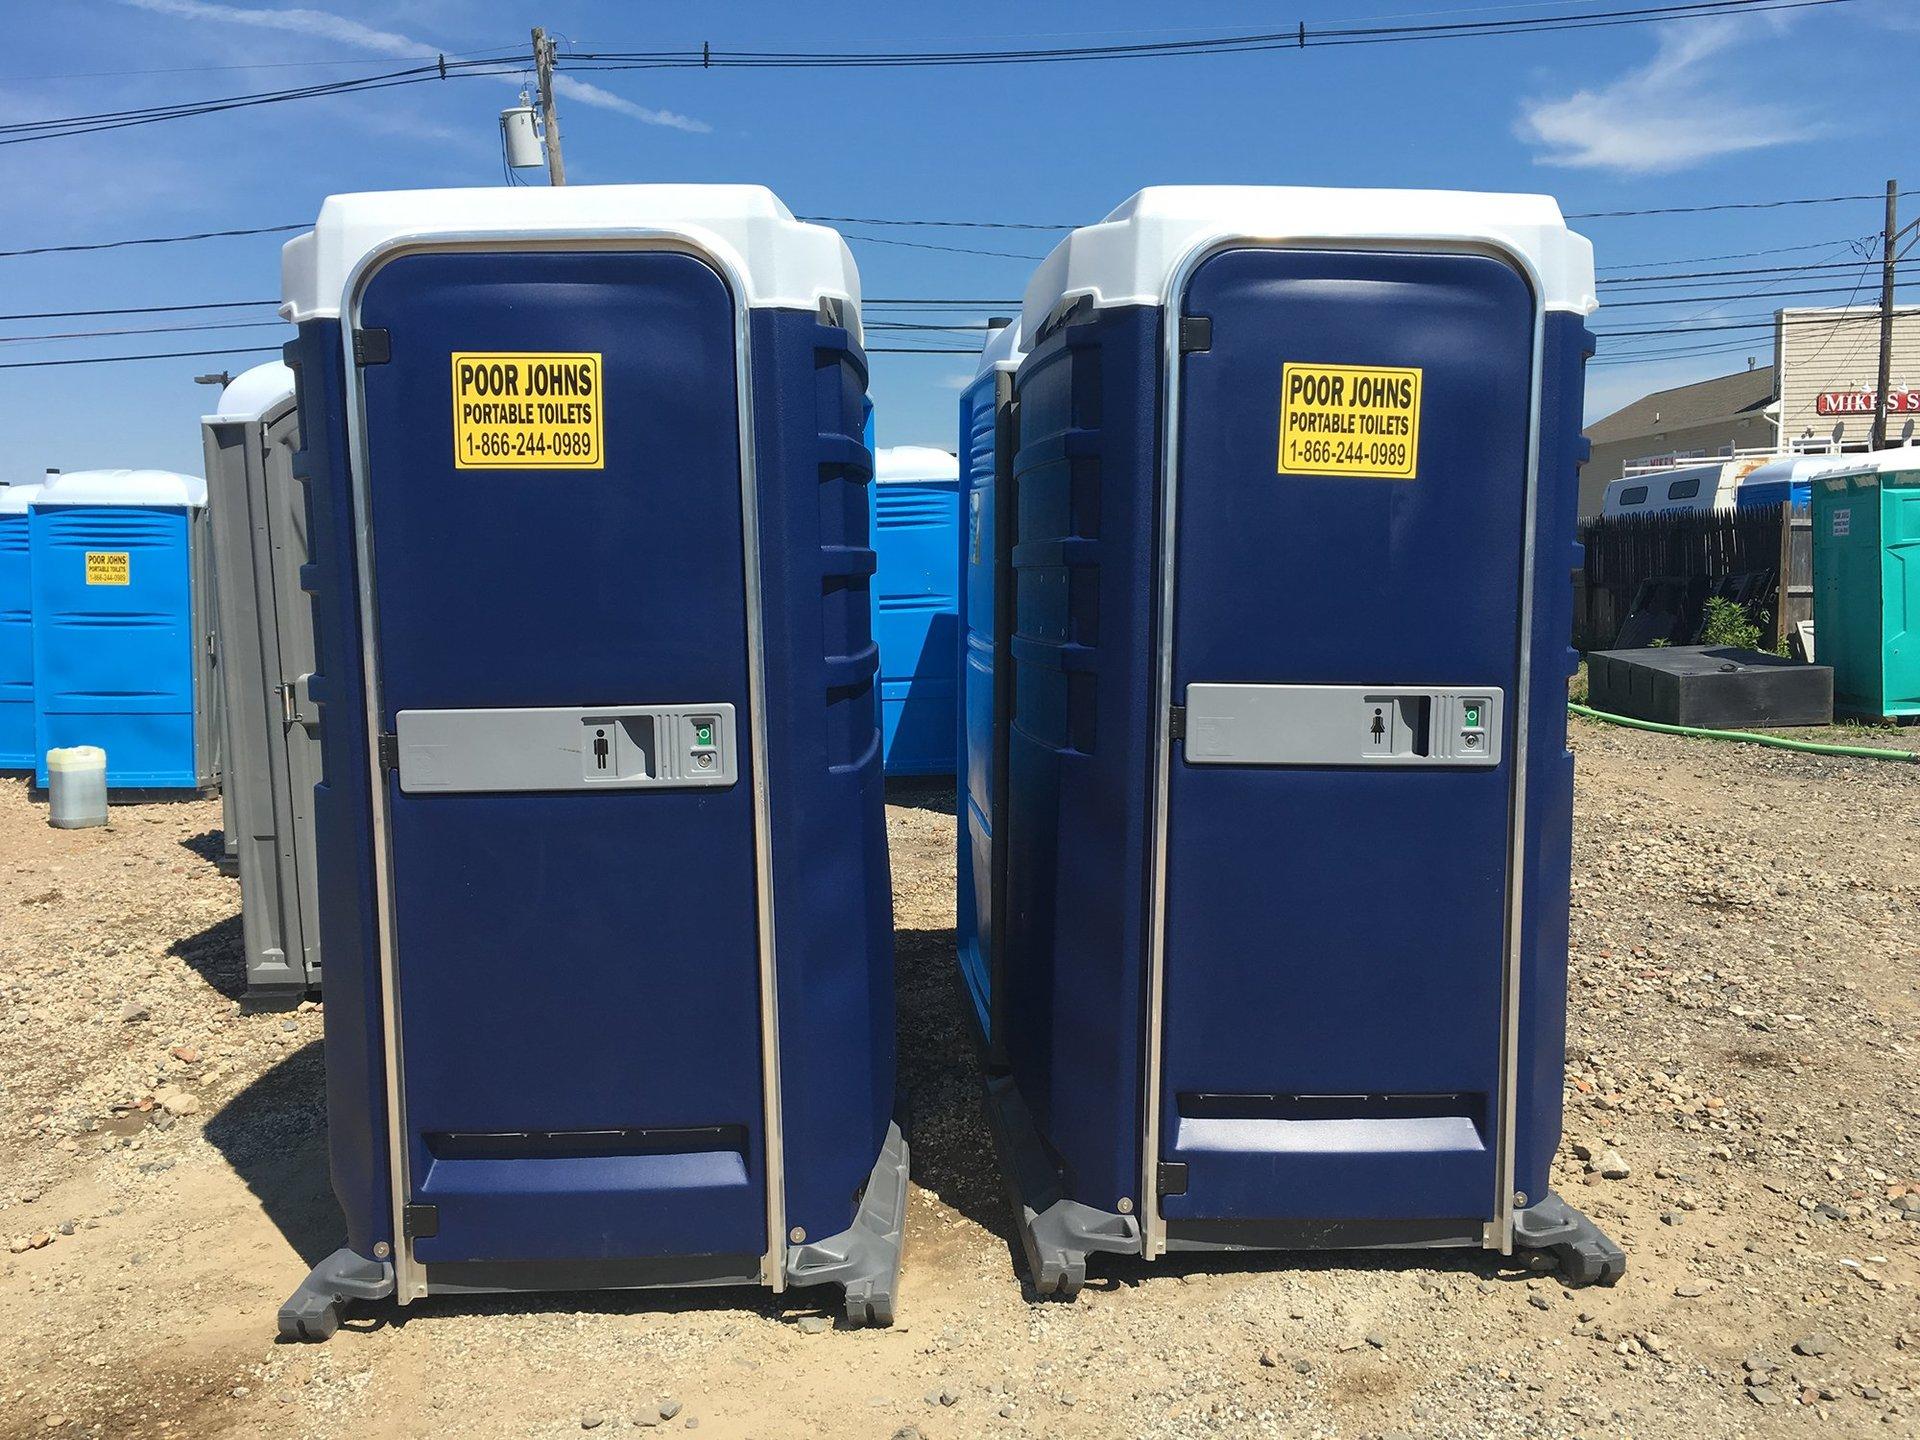 Poor John's Portable Toilets image 5